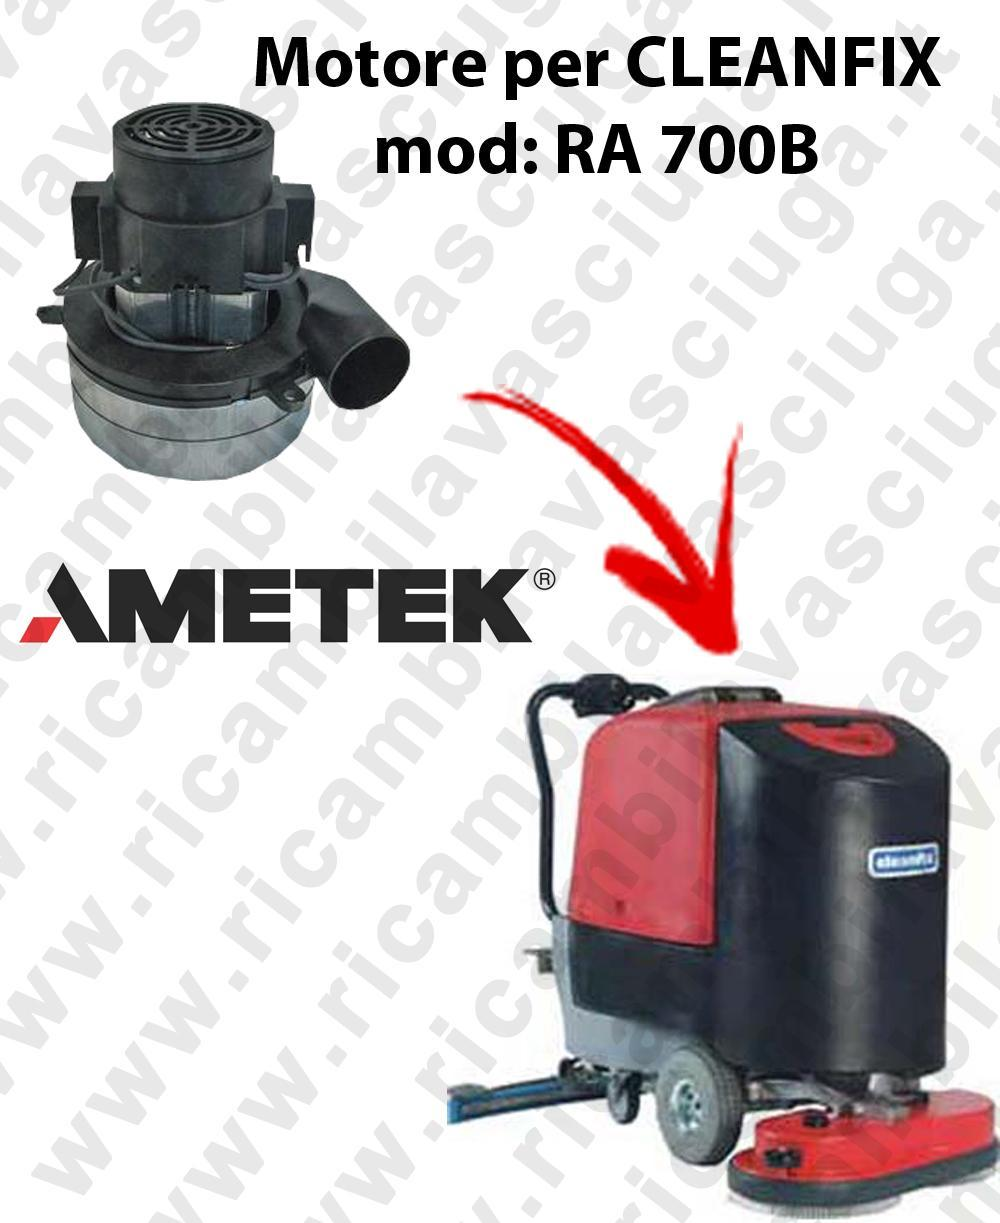 RA 700B Saugmotor AMETEK ITALIA für scheuersaugmaschinen CLEANFIX